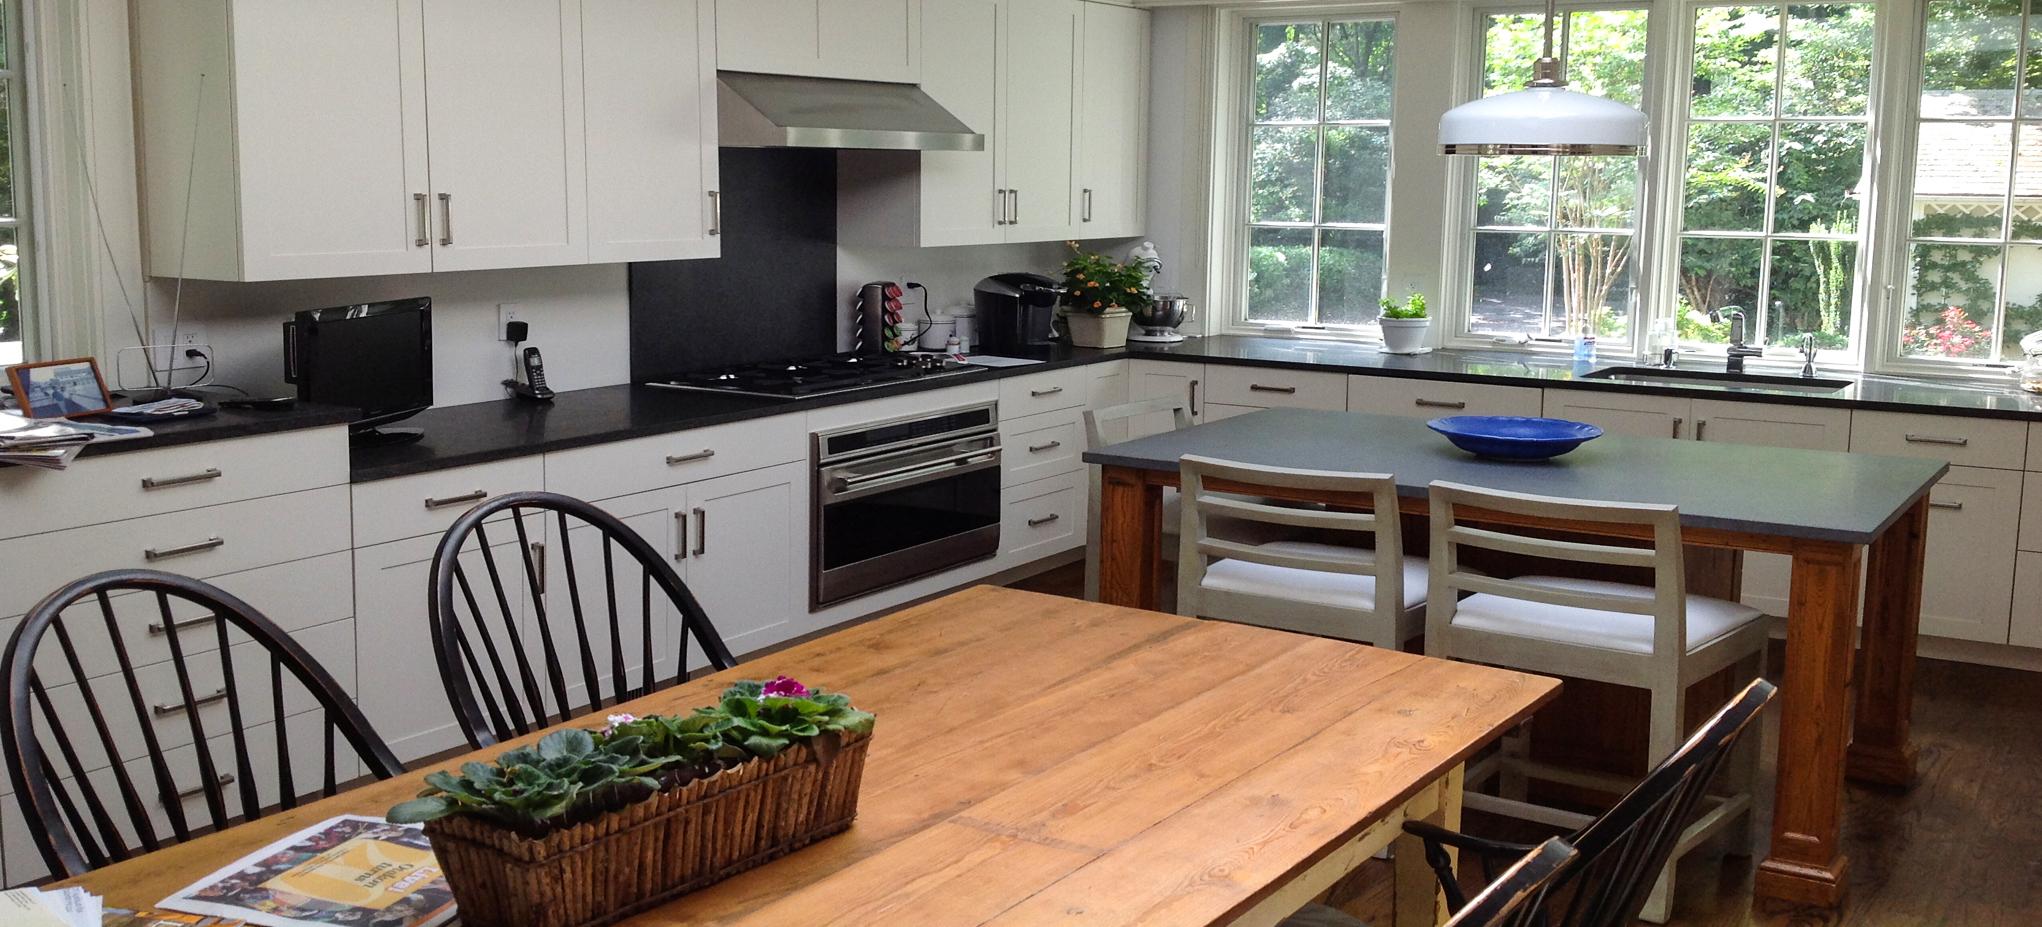 Kitchens legacy restorations for Legacy restoration